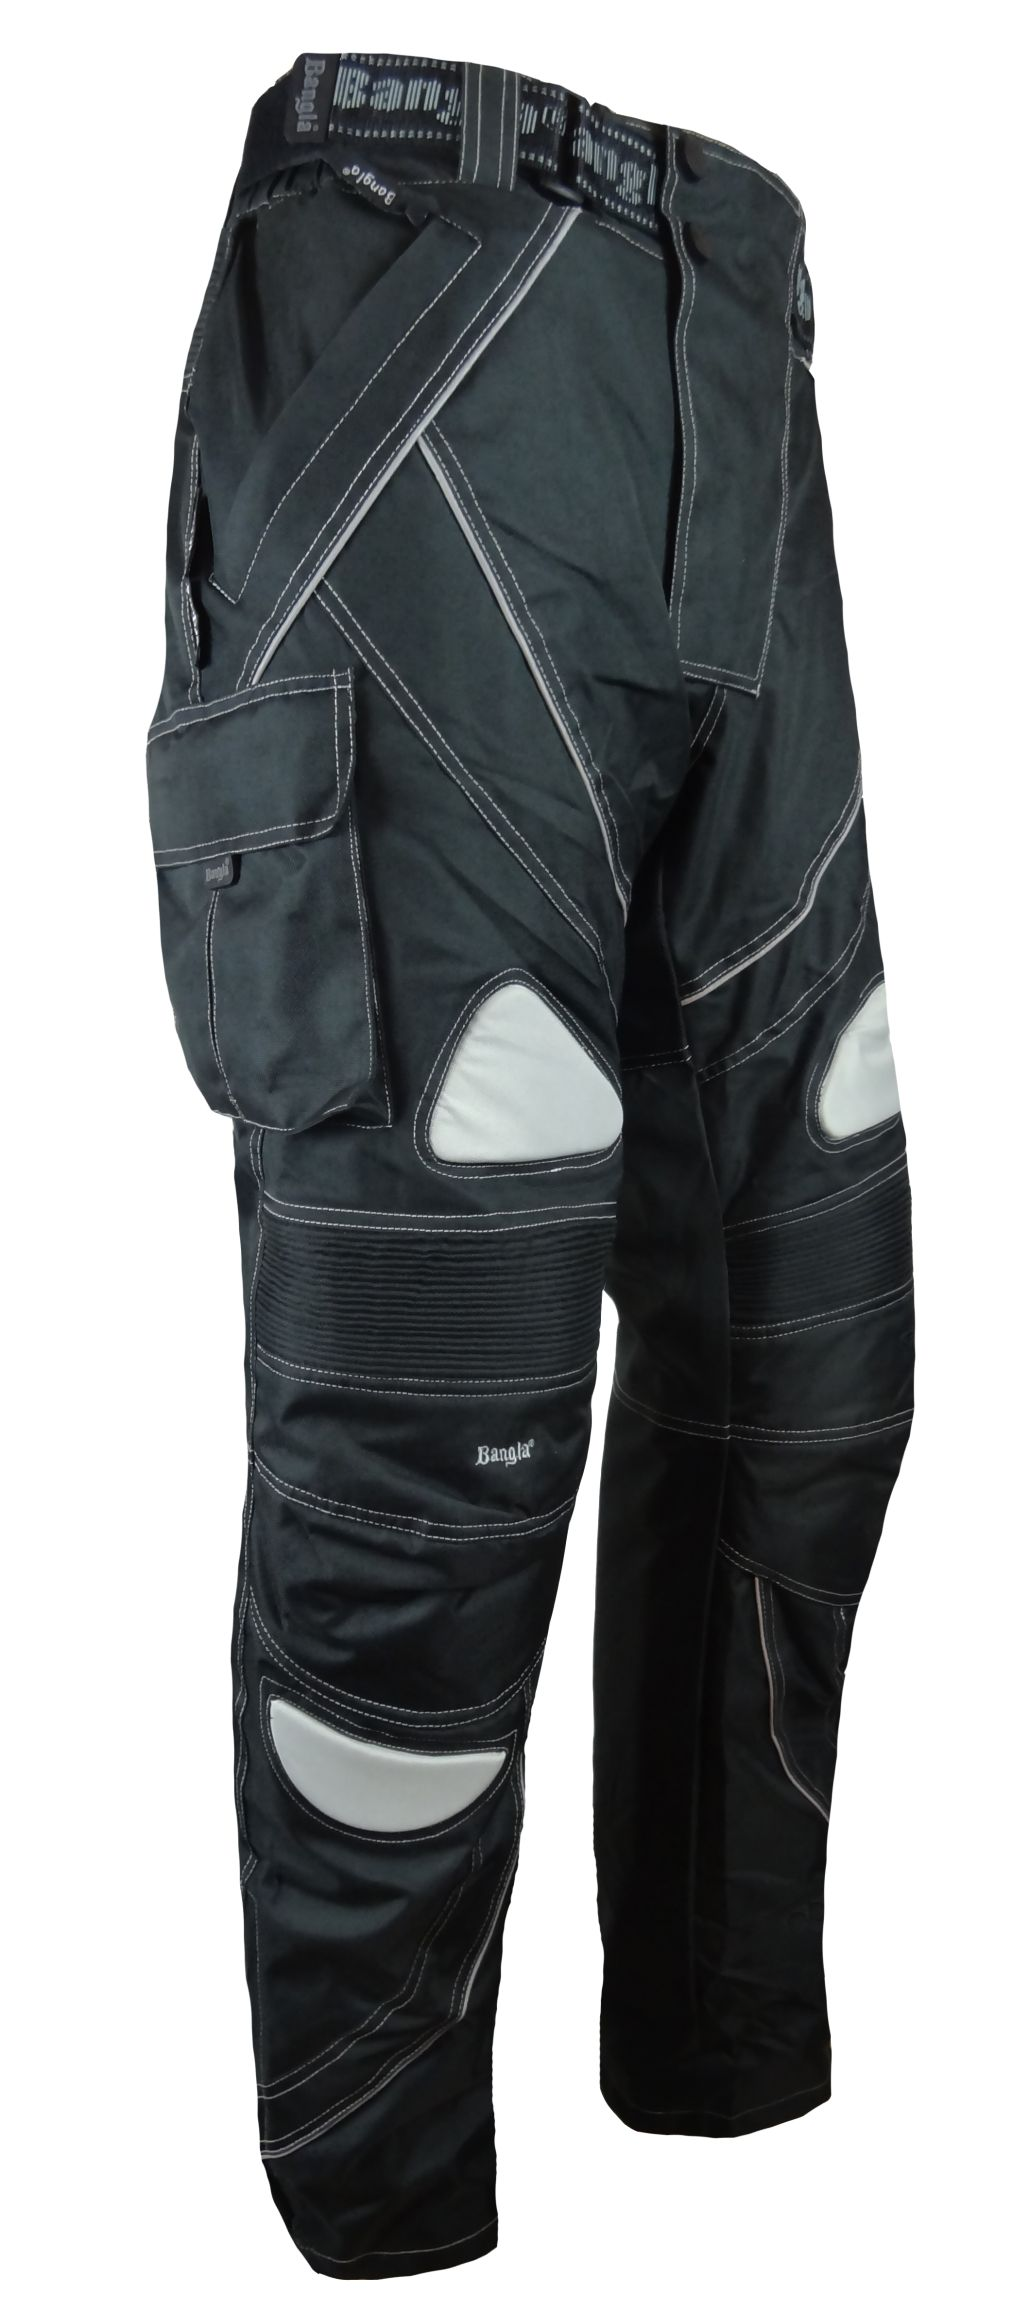 Bangla Motorrad Hose Motorradhose Textil Cordura Schwarz Grau  S M L - 6XL